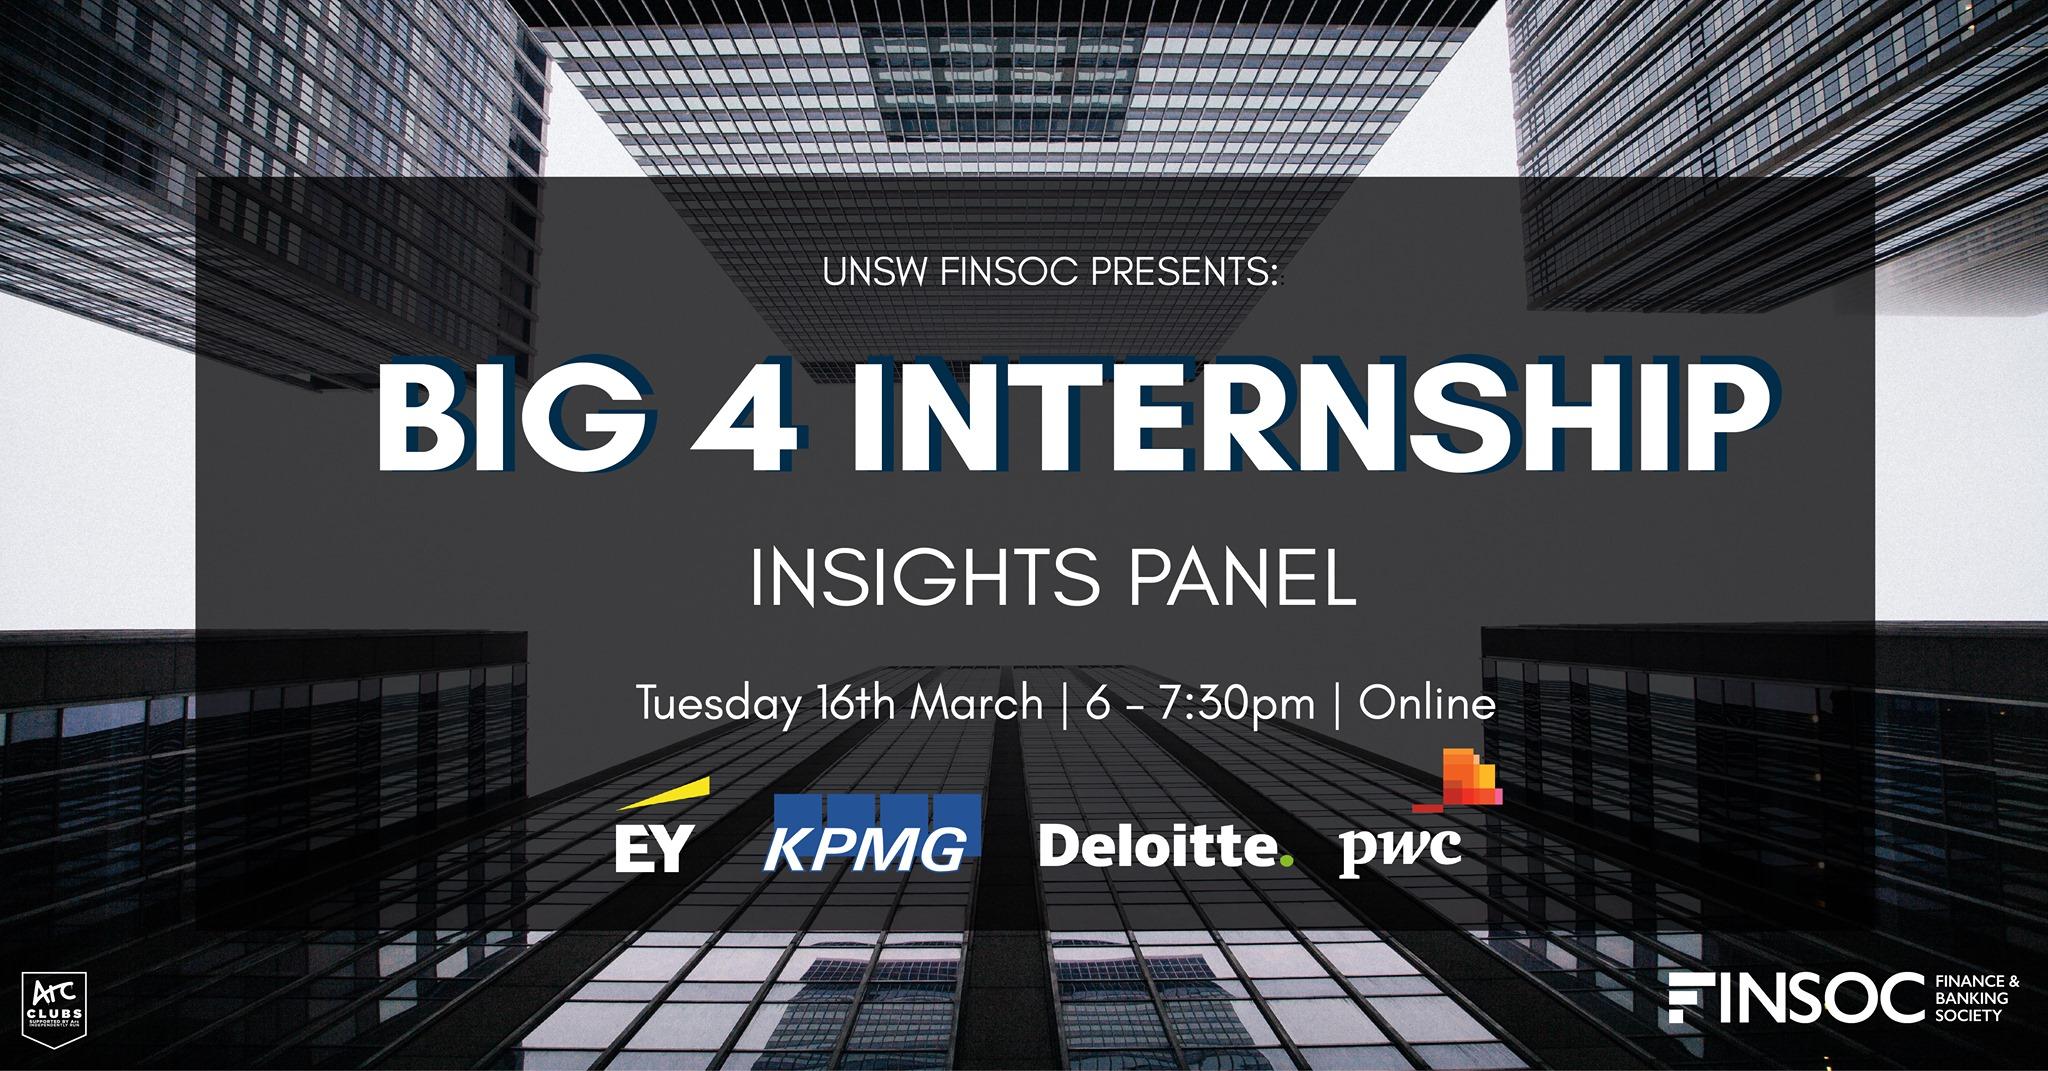 UNSW Finsoc Presents: Big 4 Internship Insights Panel